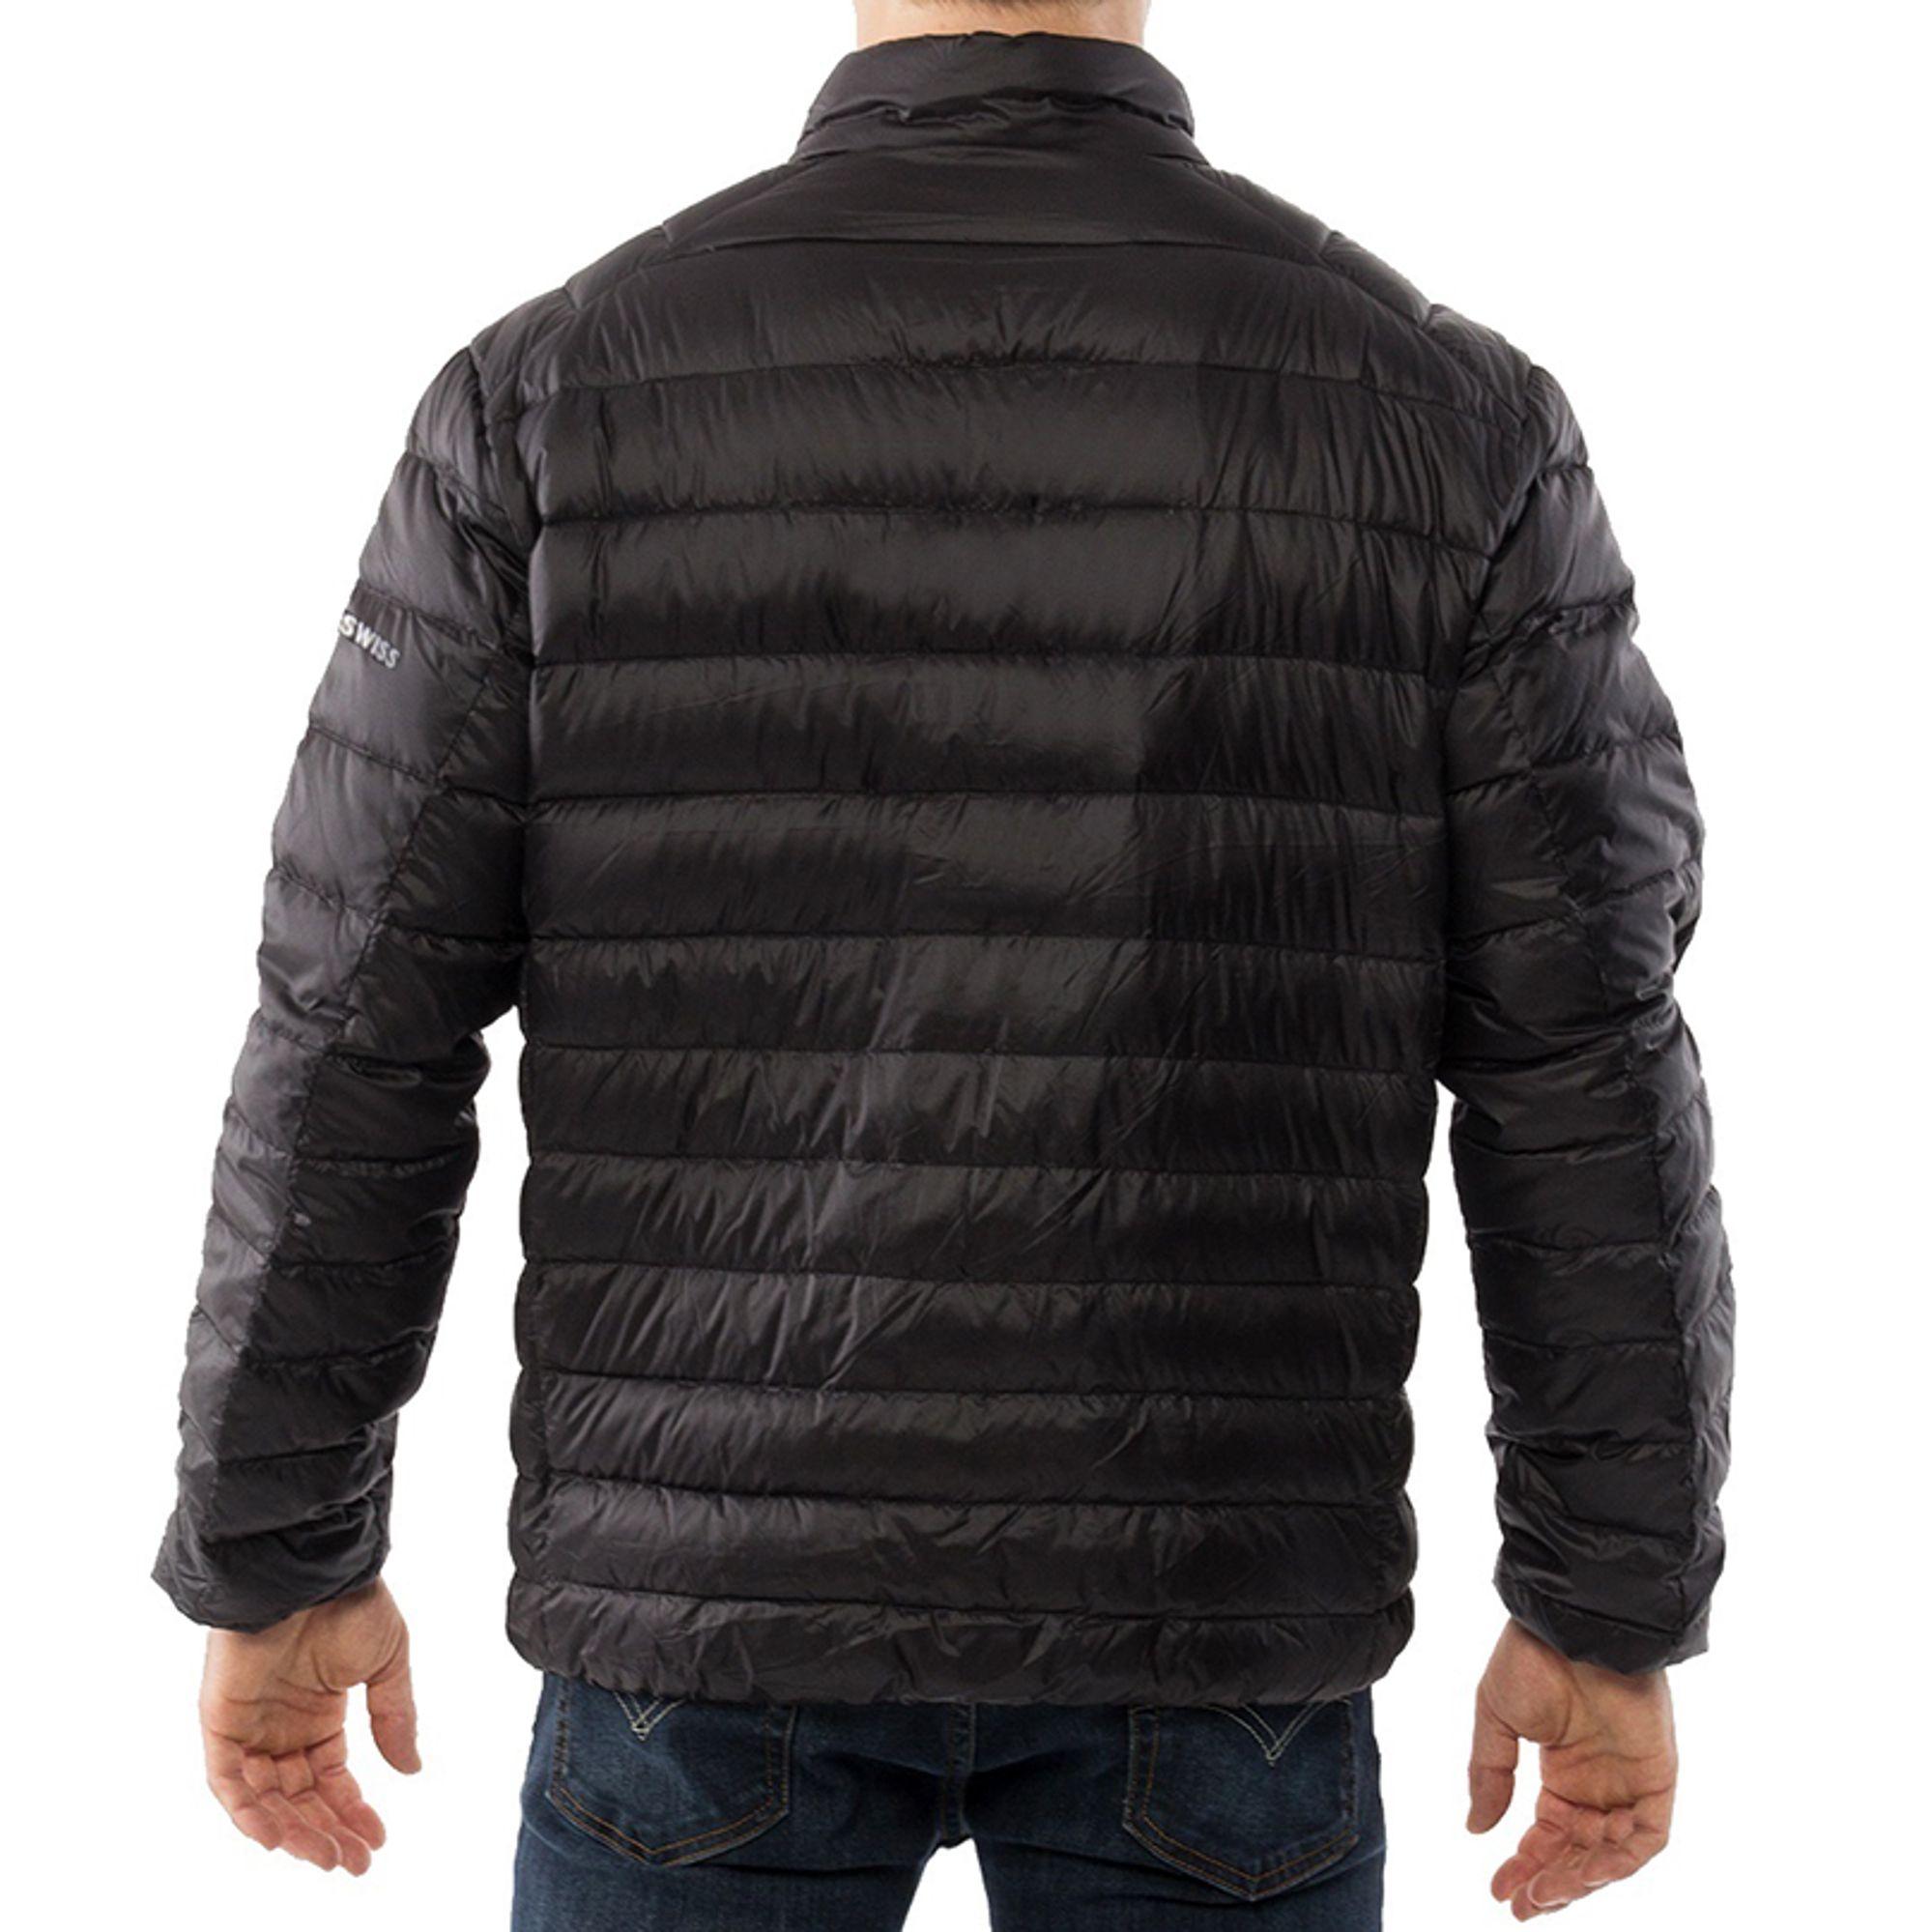 2df655e9cd7 2019 Free Fashion Swiss Niko Packable Light Mens Down Jacket Puffer Bubble  Coat Warm Parka From Gcx1967, $26.39 | DHgate.Com